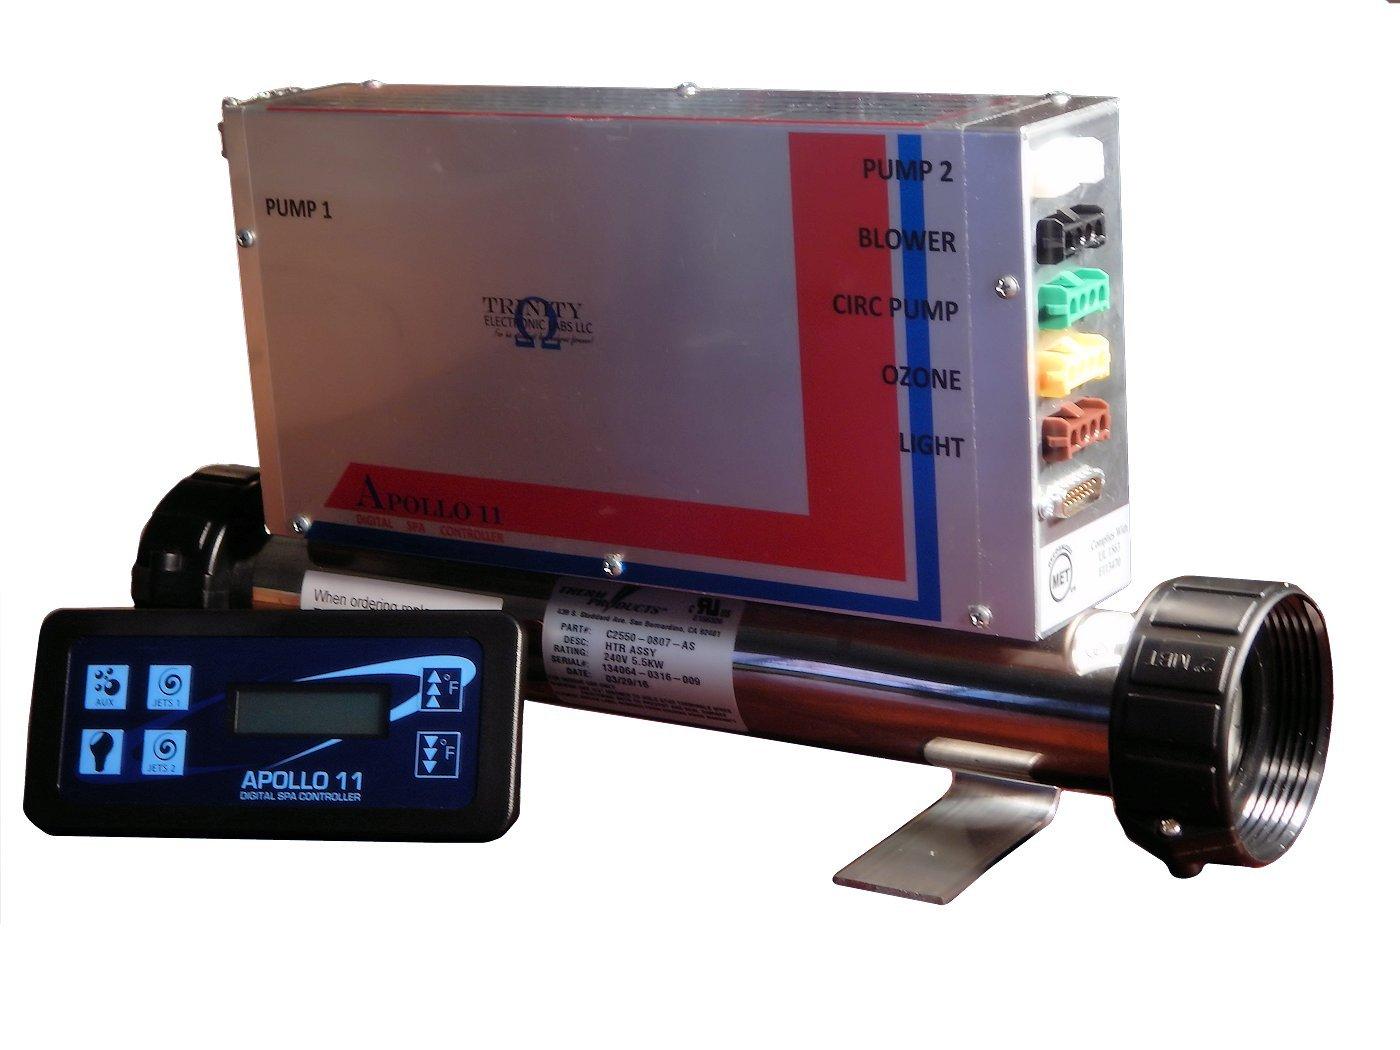 Amazon.com : Apollo 11 Digital Spa Controller /Spa Pack / Spa Control Syrtem 2 Pumps, Blower, Circ Pump, Ozone, Fiber Optic Light.